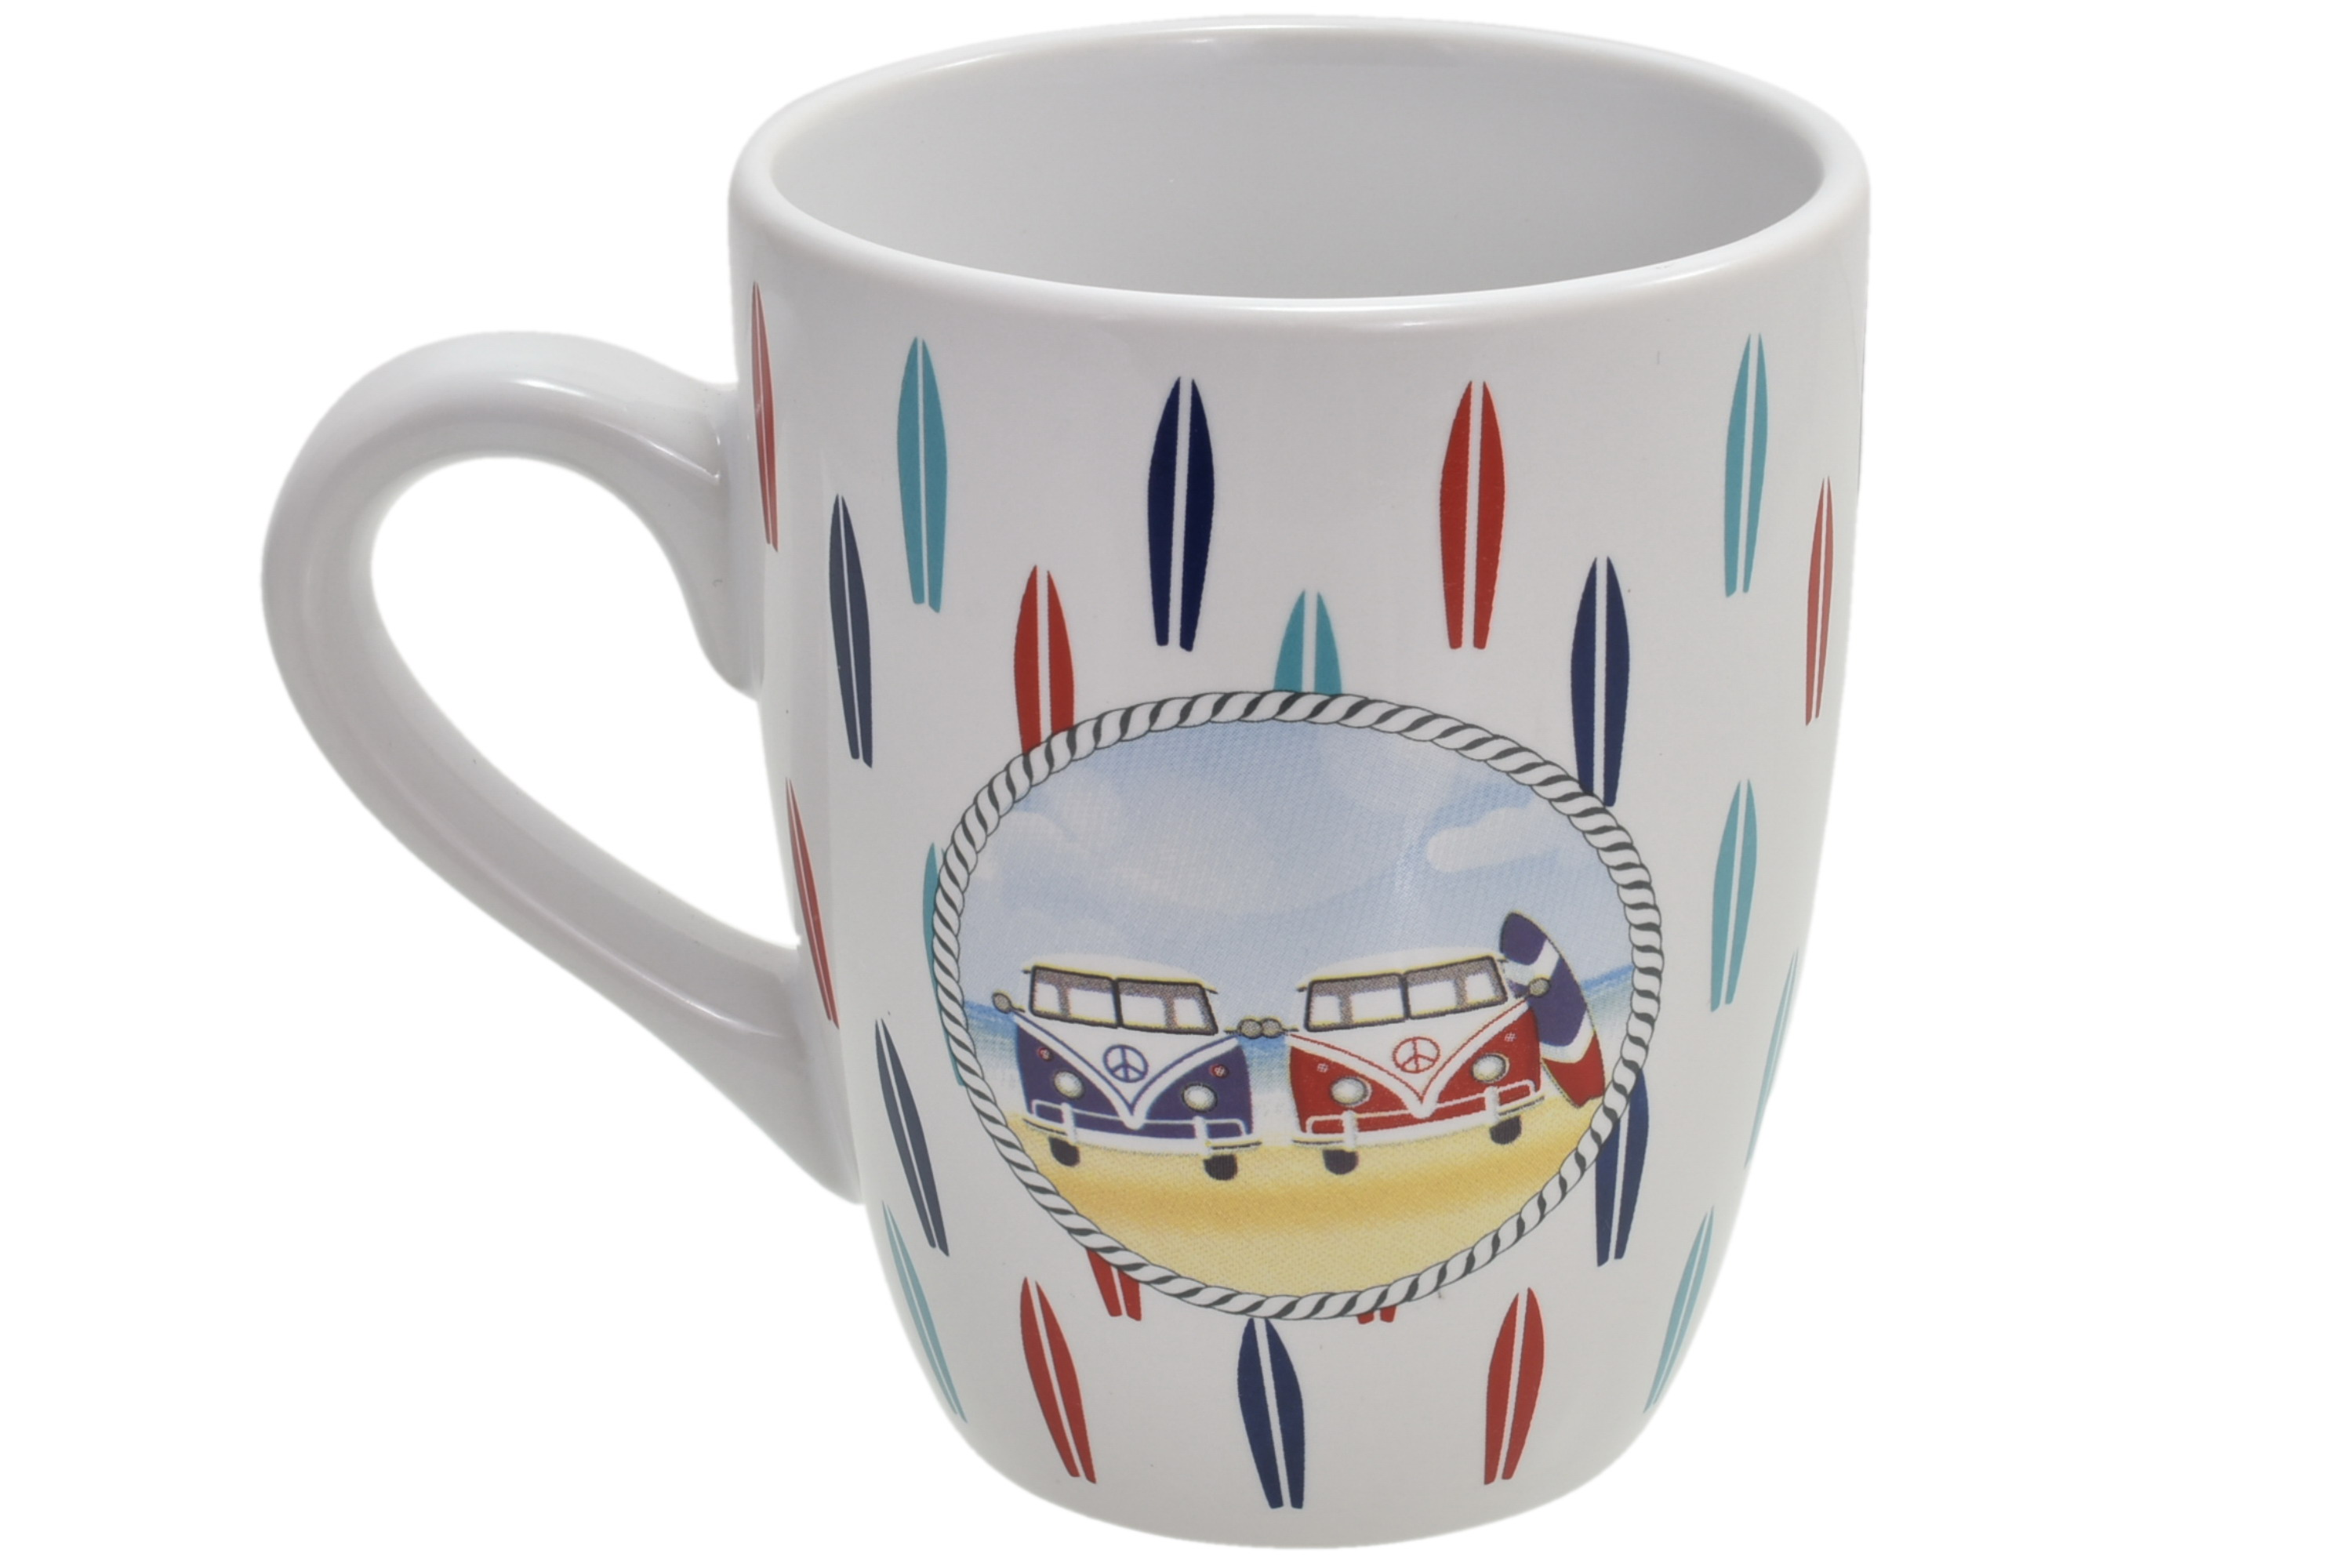 Ceramic Surf Bus Design Mug Surfboards Print